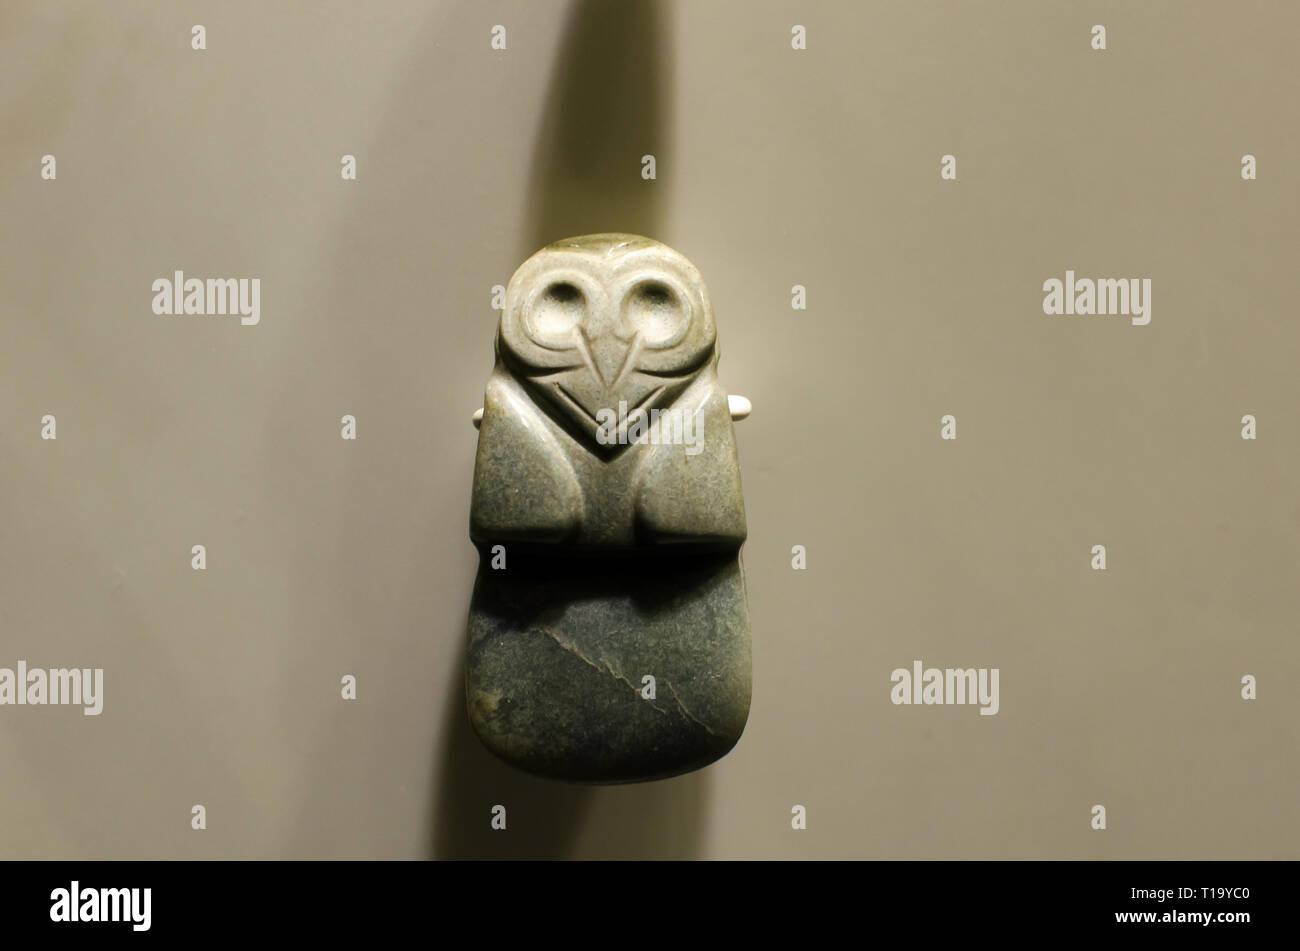 Objects at Museo del Jade y la Cultura Precolombina in Costa Rica - Stock Image